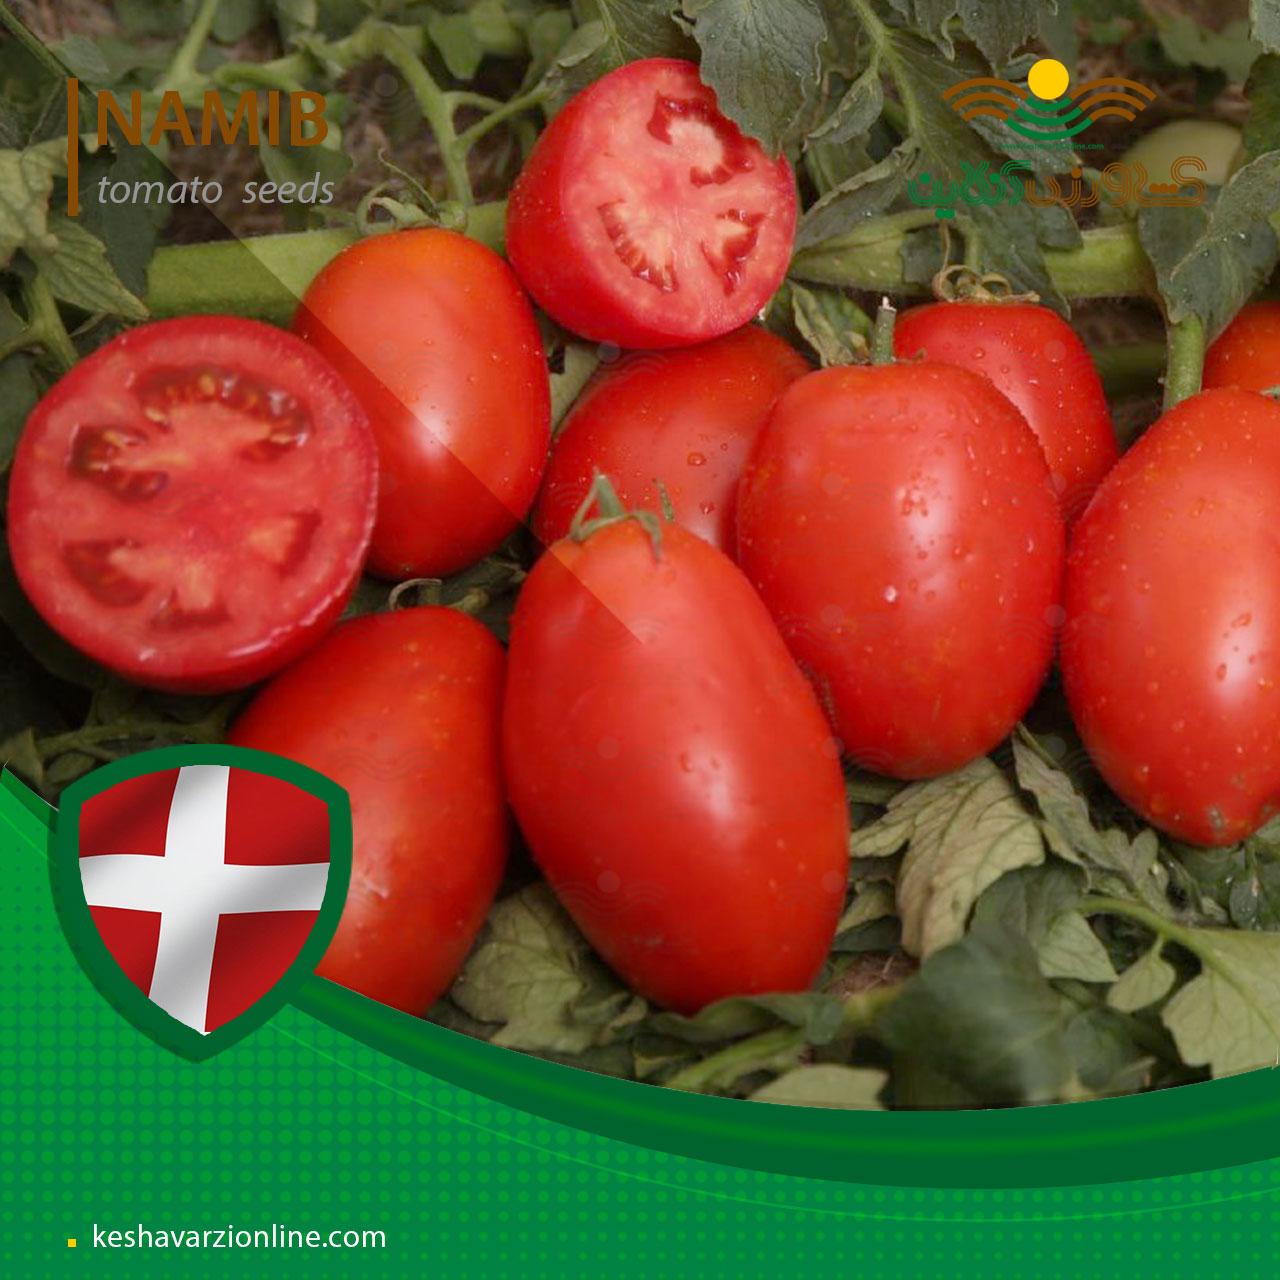 بذر گوجه فرنگی نامیب